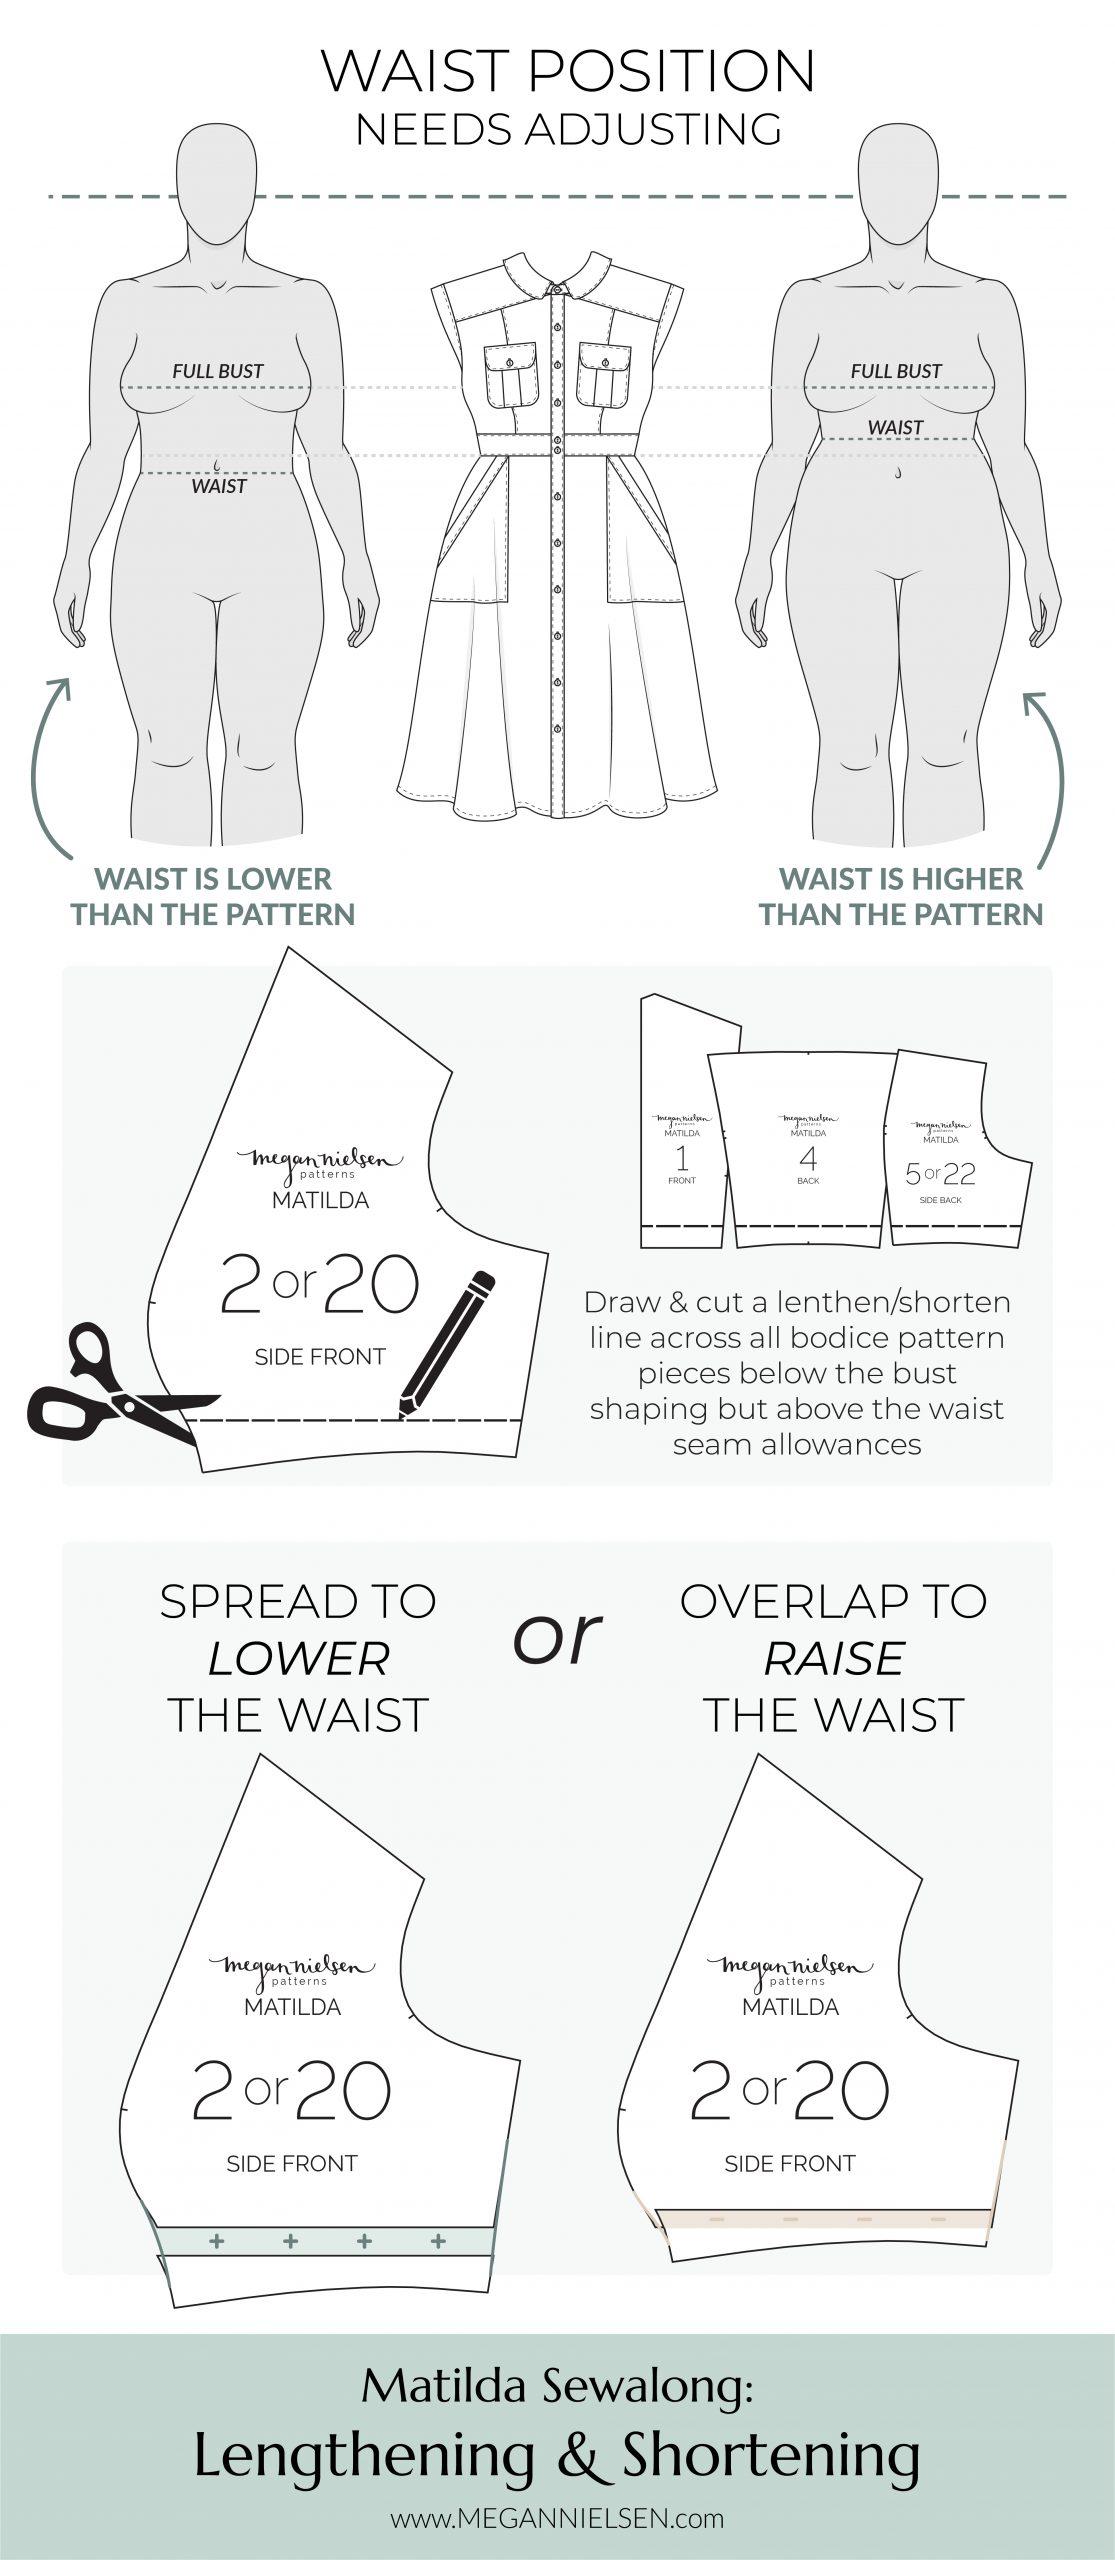 Megan Nielsen Patterns | Matilda Sewalong: Lengthening & Shortening - Adjusting The Waist Position